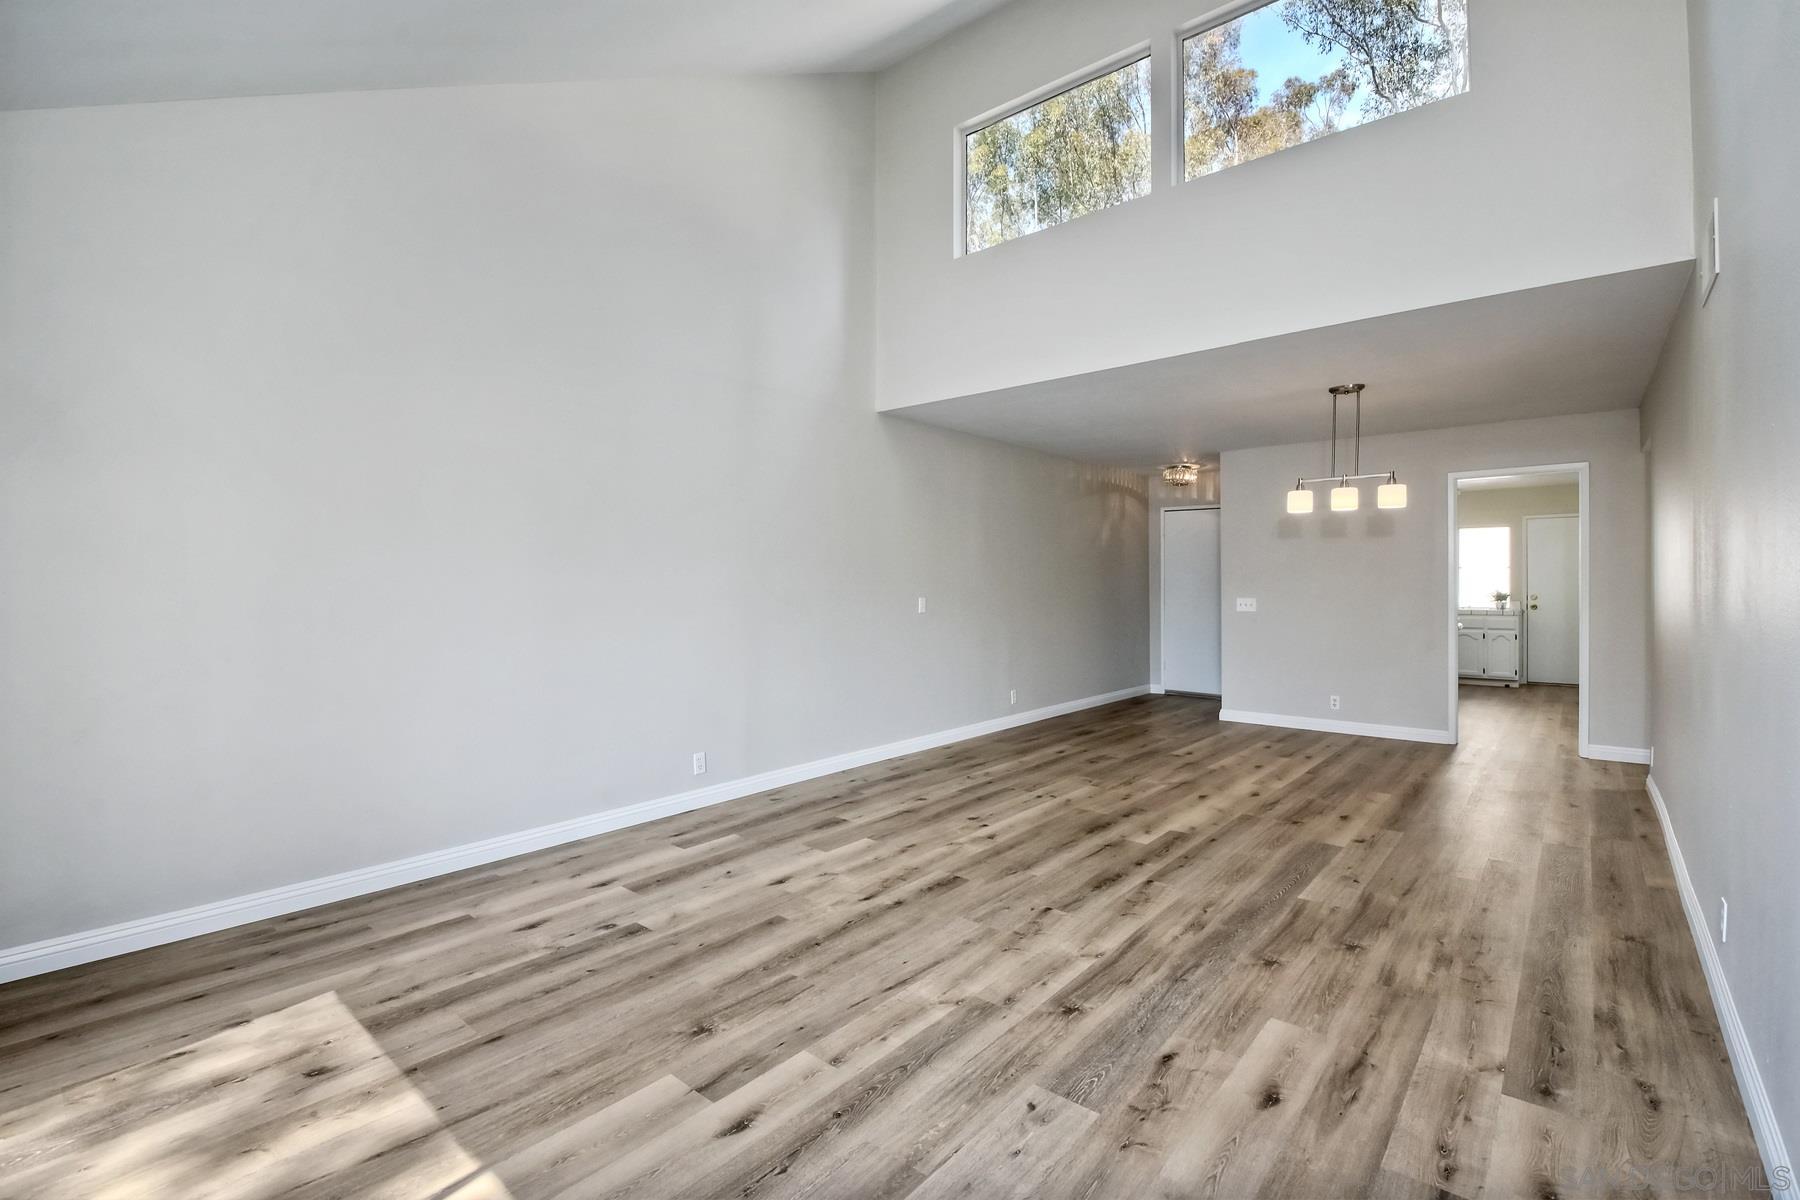 10341 Caminito Covewood, San Diego CA 92131